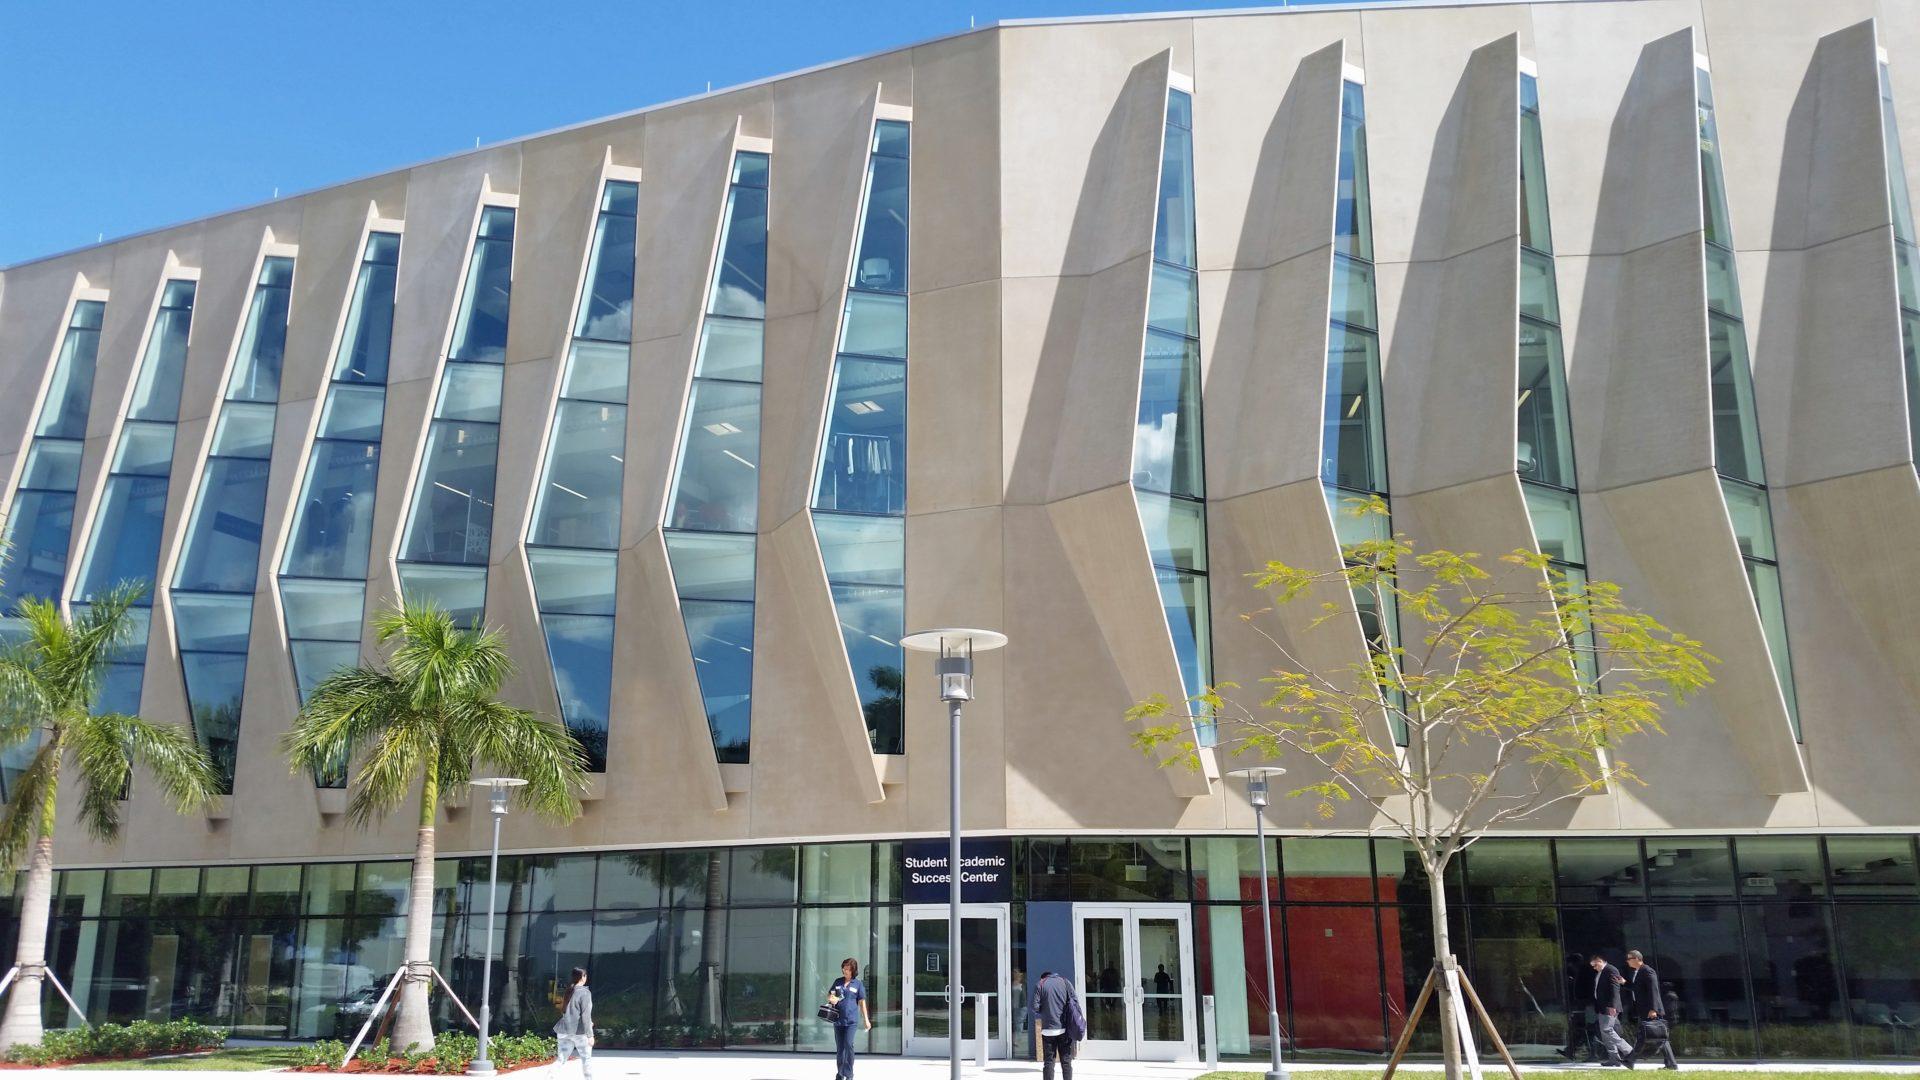 Student Academic Center